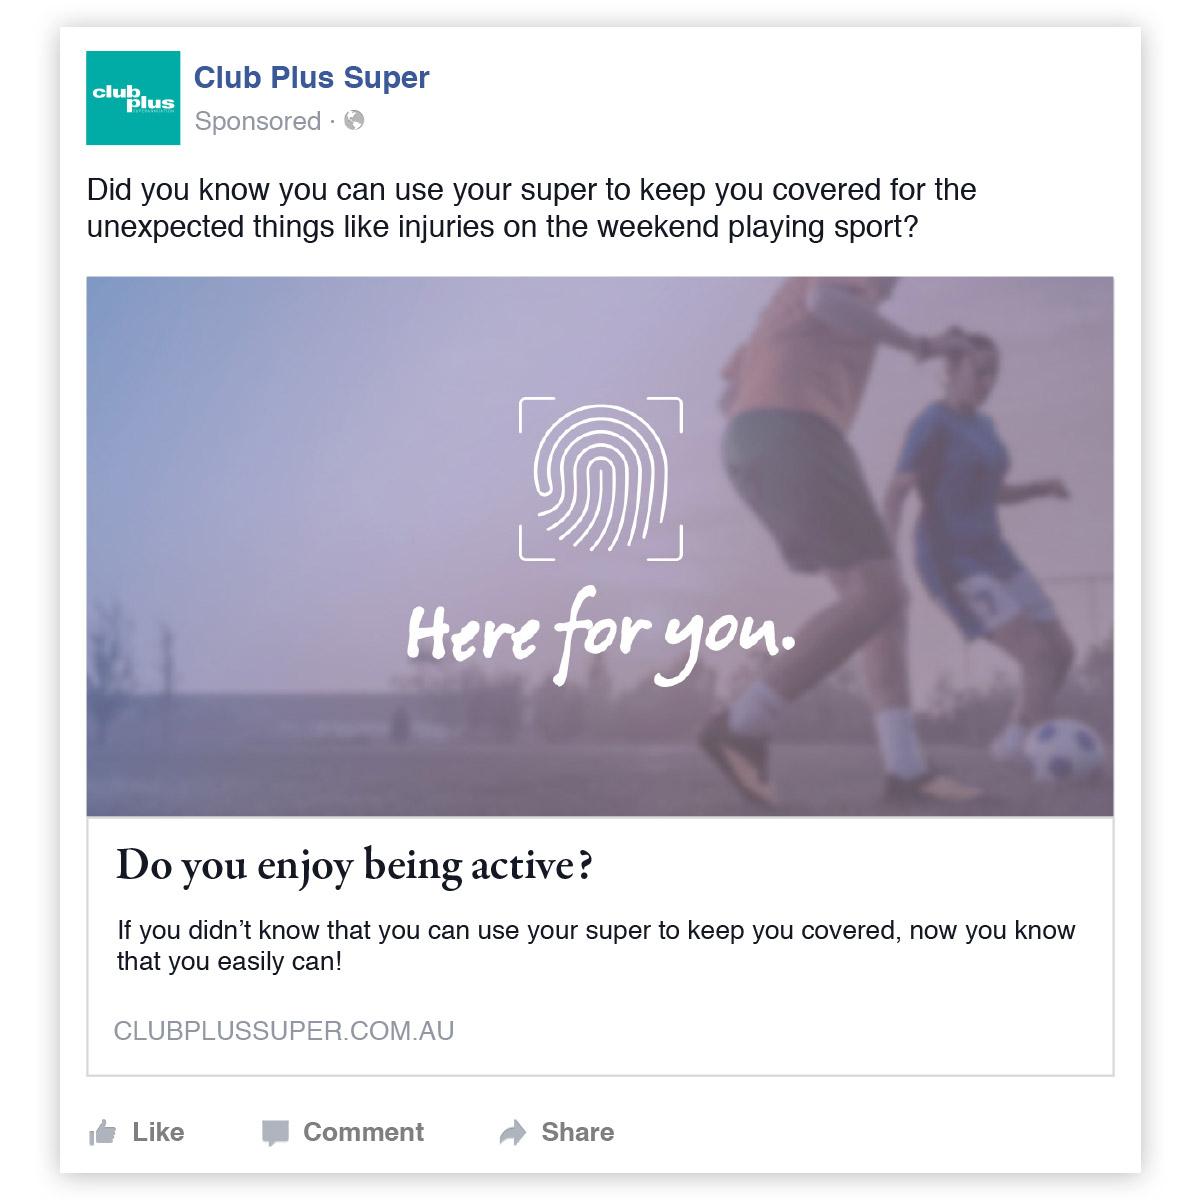 CPS-social-advertising-1.jpg